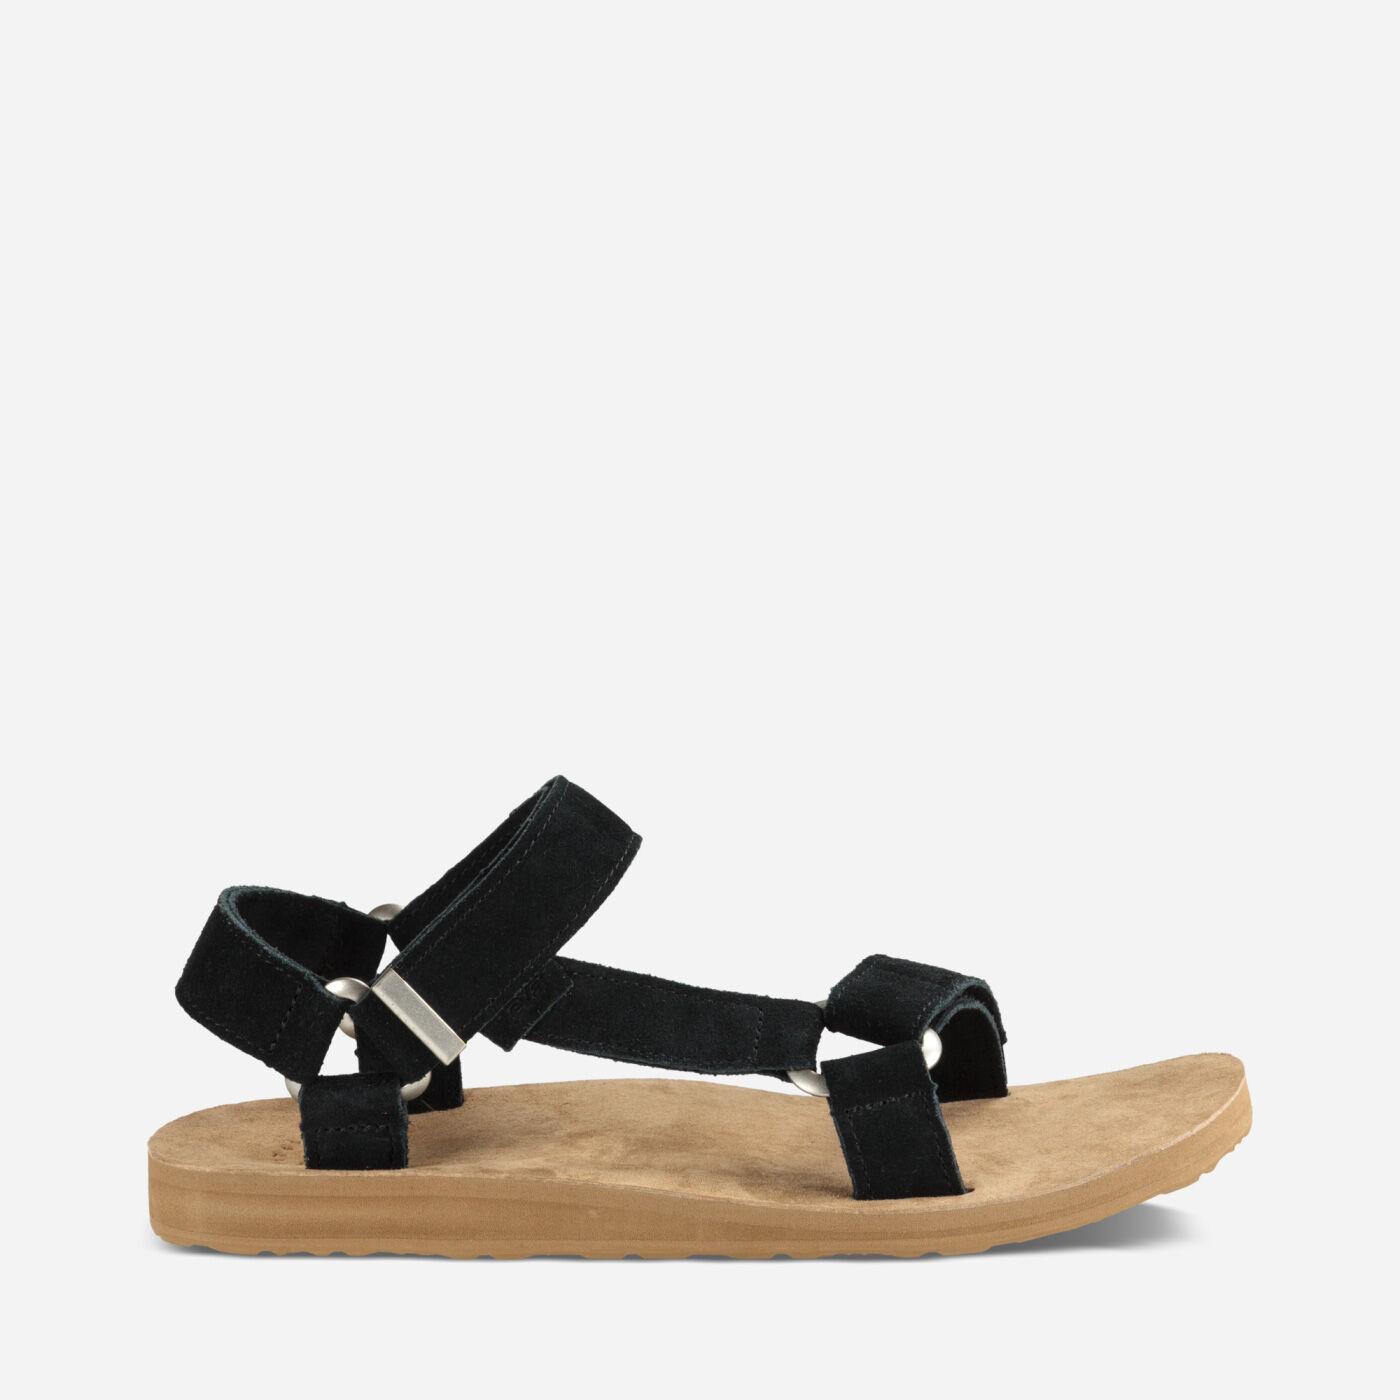 Shoes zone sandals - Original Universal Suede